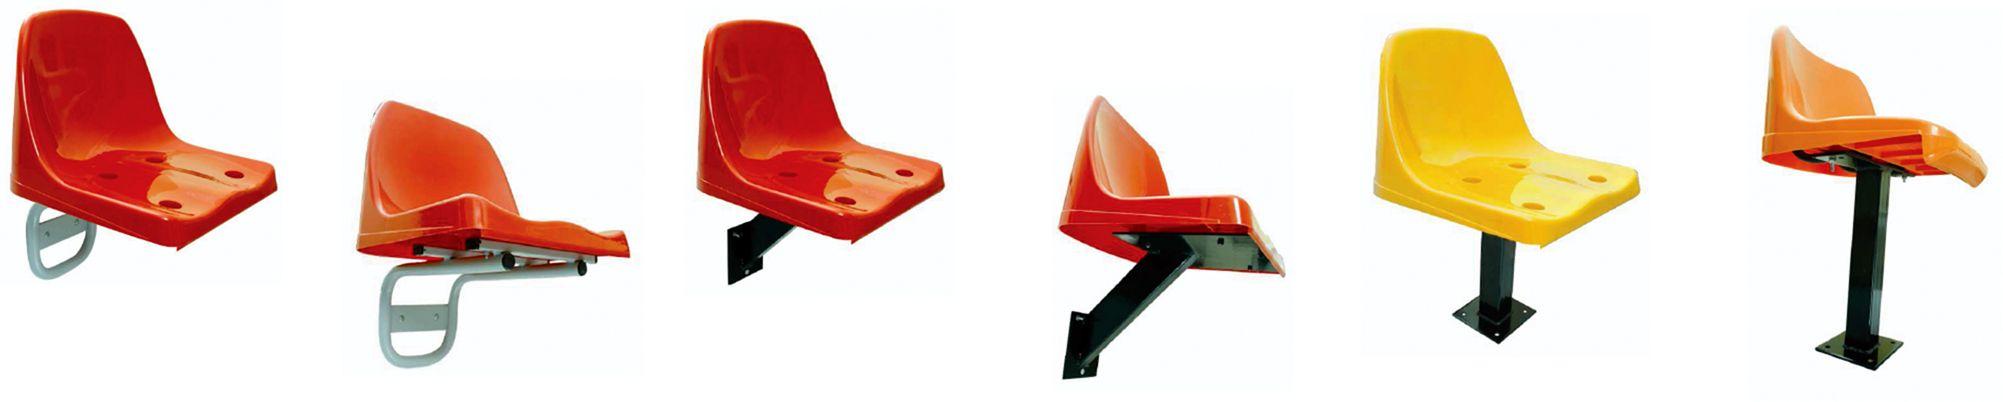 beta_backrest_monoblock_copolymer_pp_stadium_chair_seatorium_13